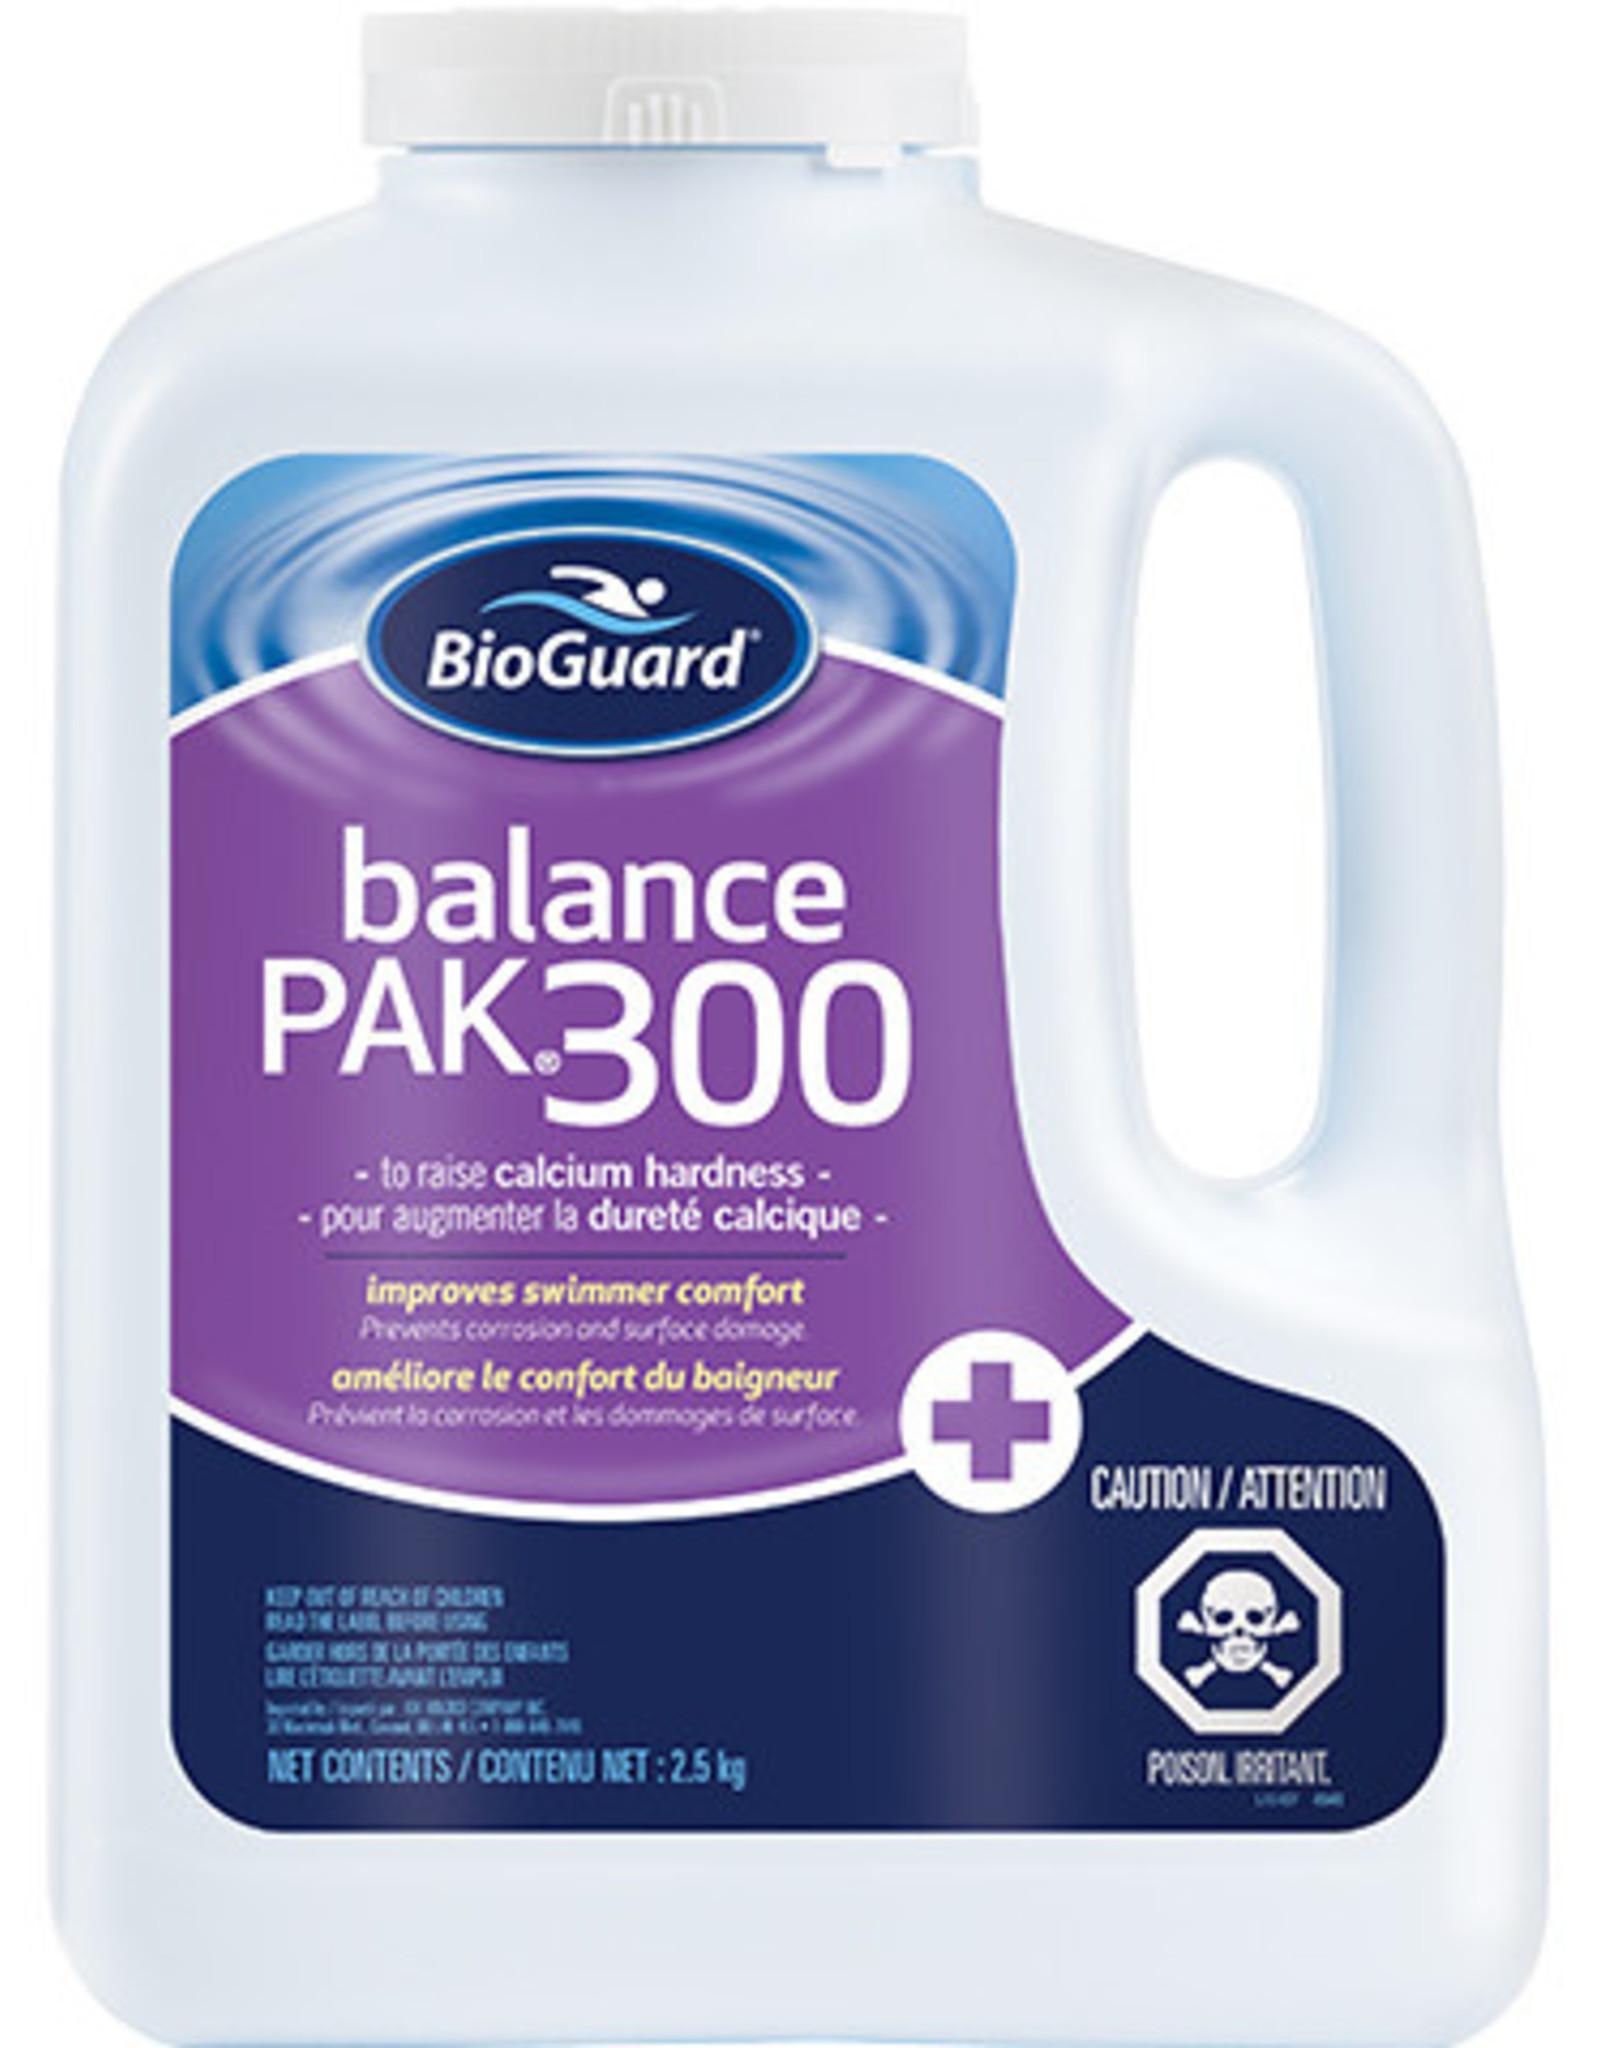 BIOGUARD BioGuard Balance Pak 300 2.5 Kg